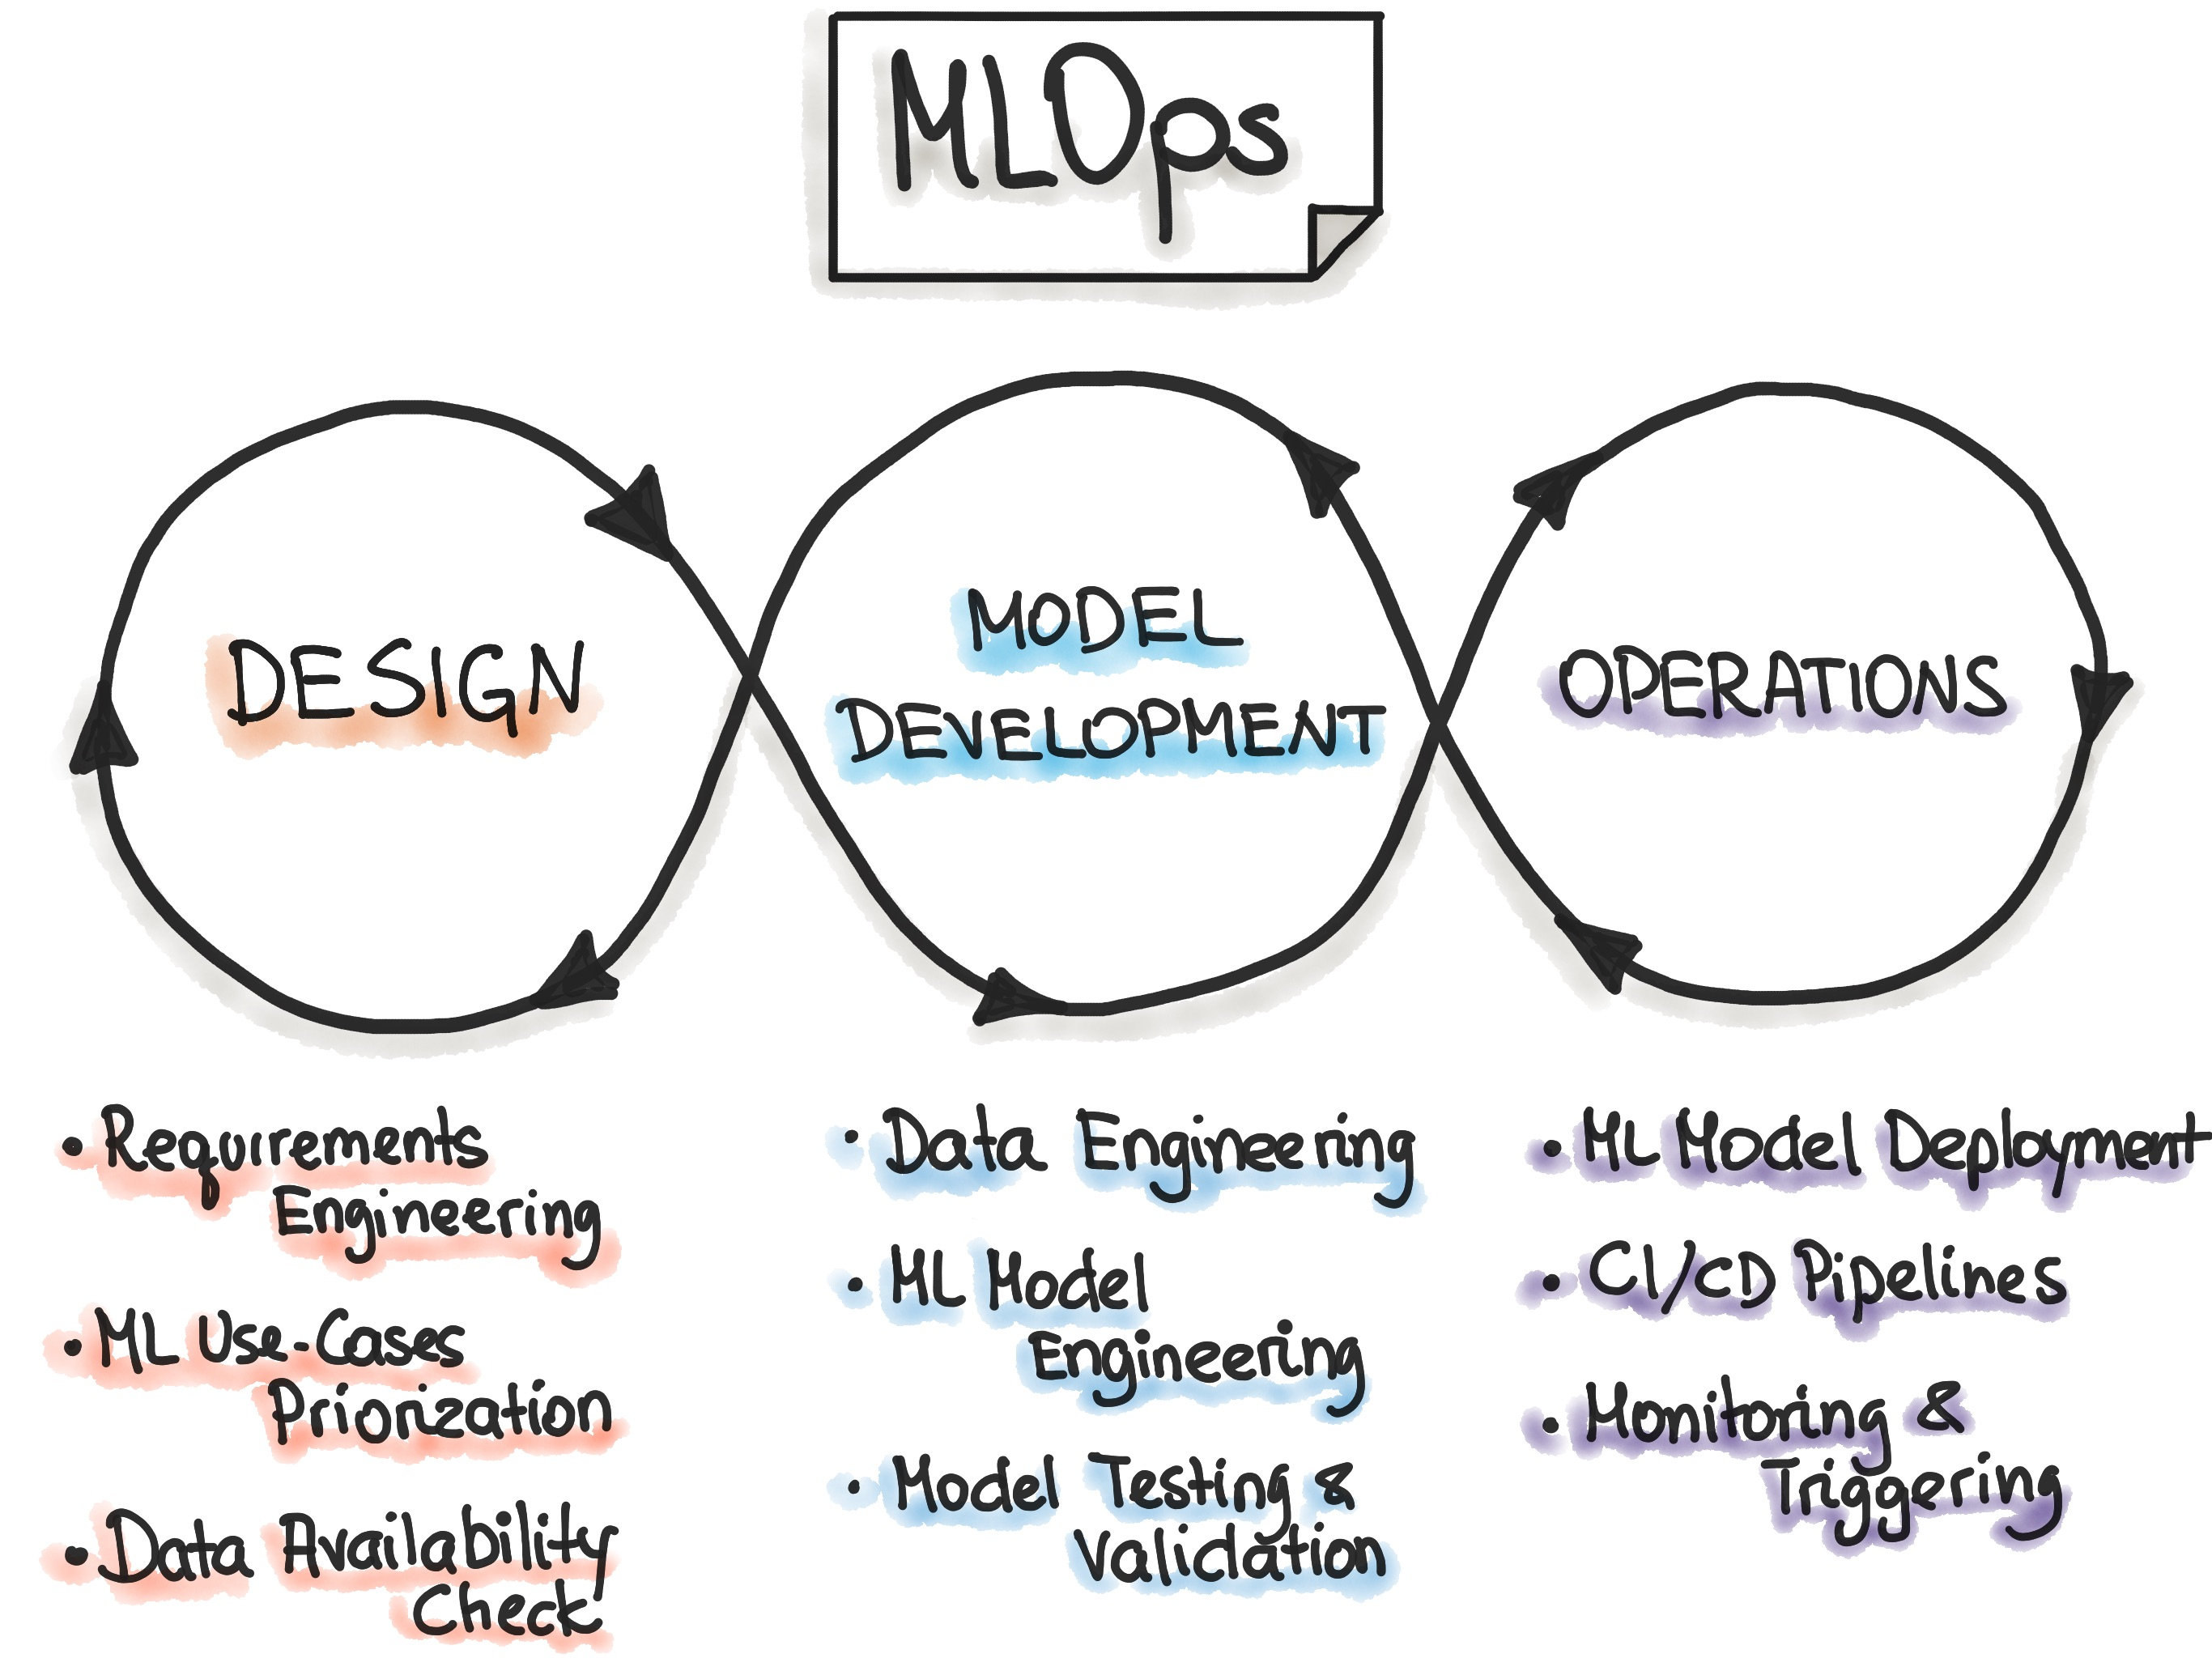 MLOps Principles